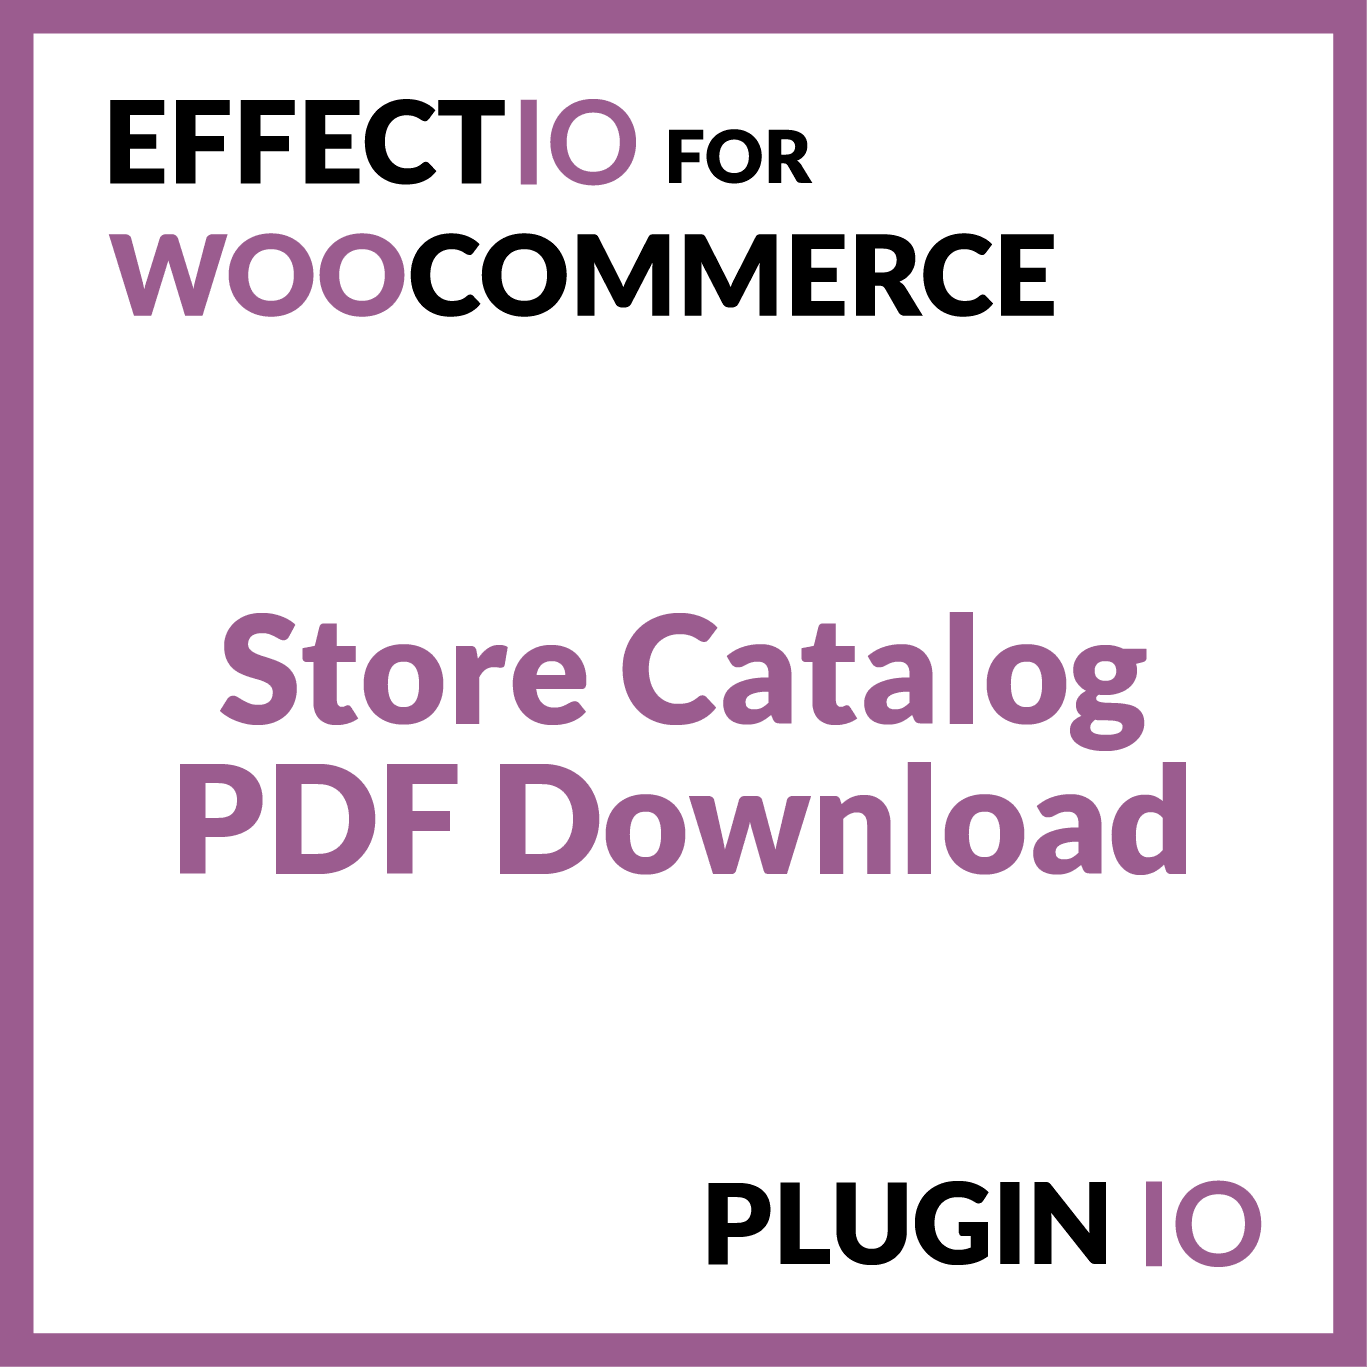 Woocommerce Store Catalog Pdf